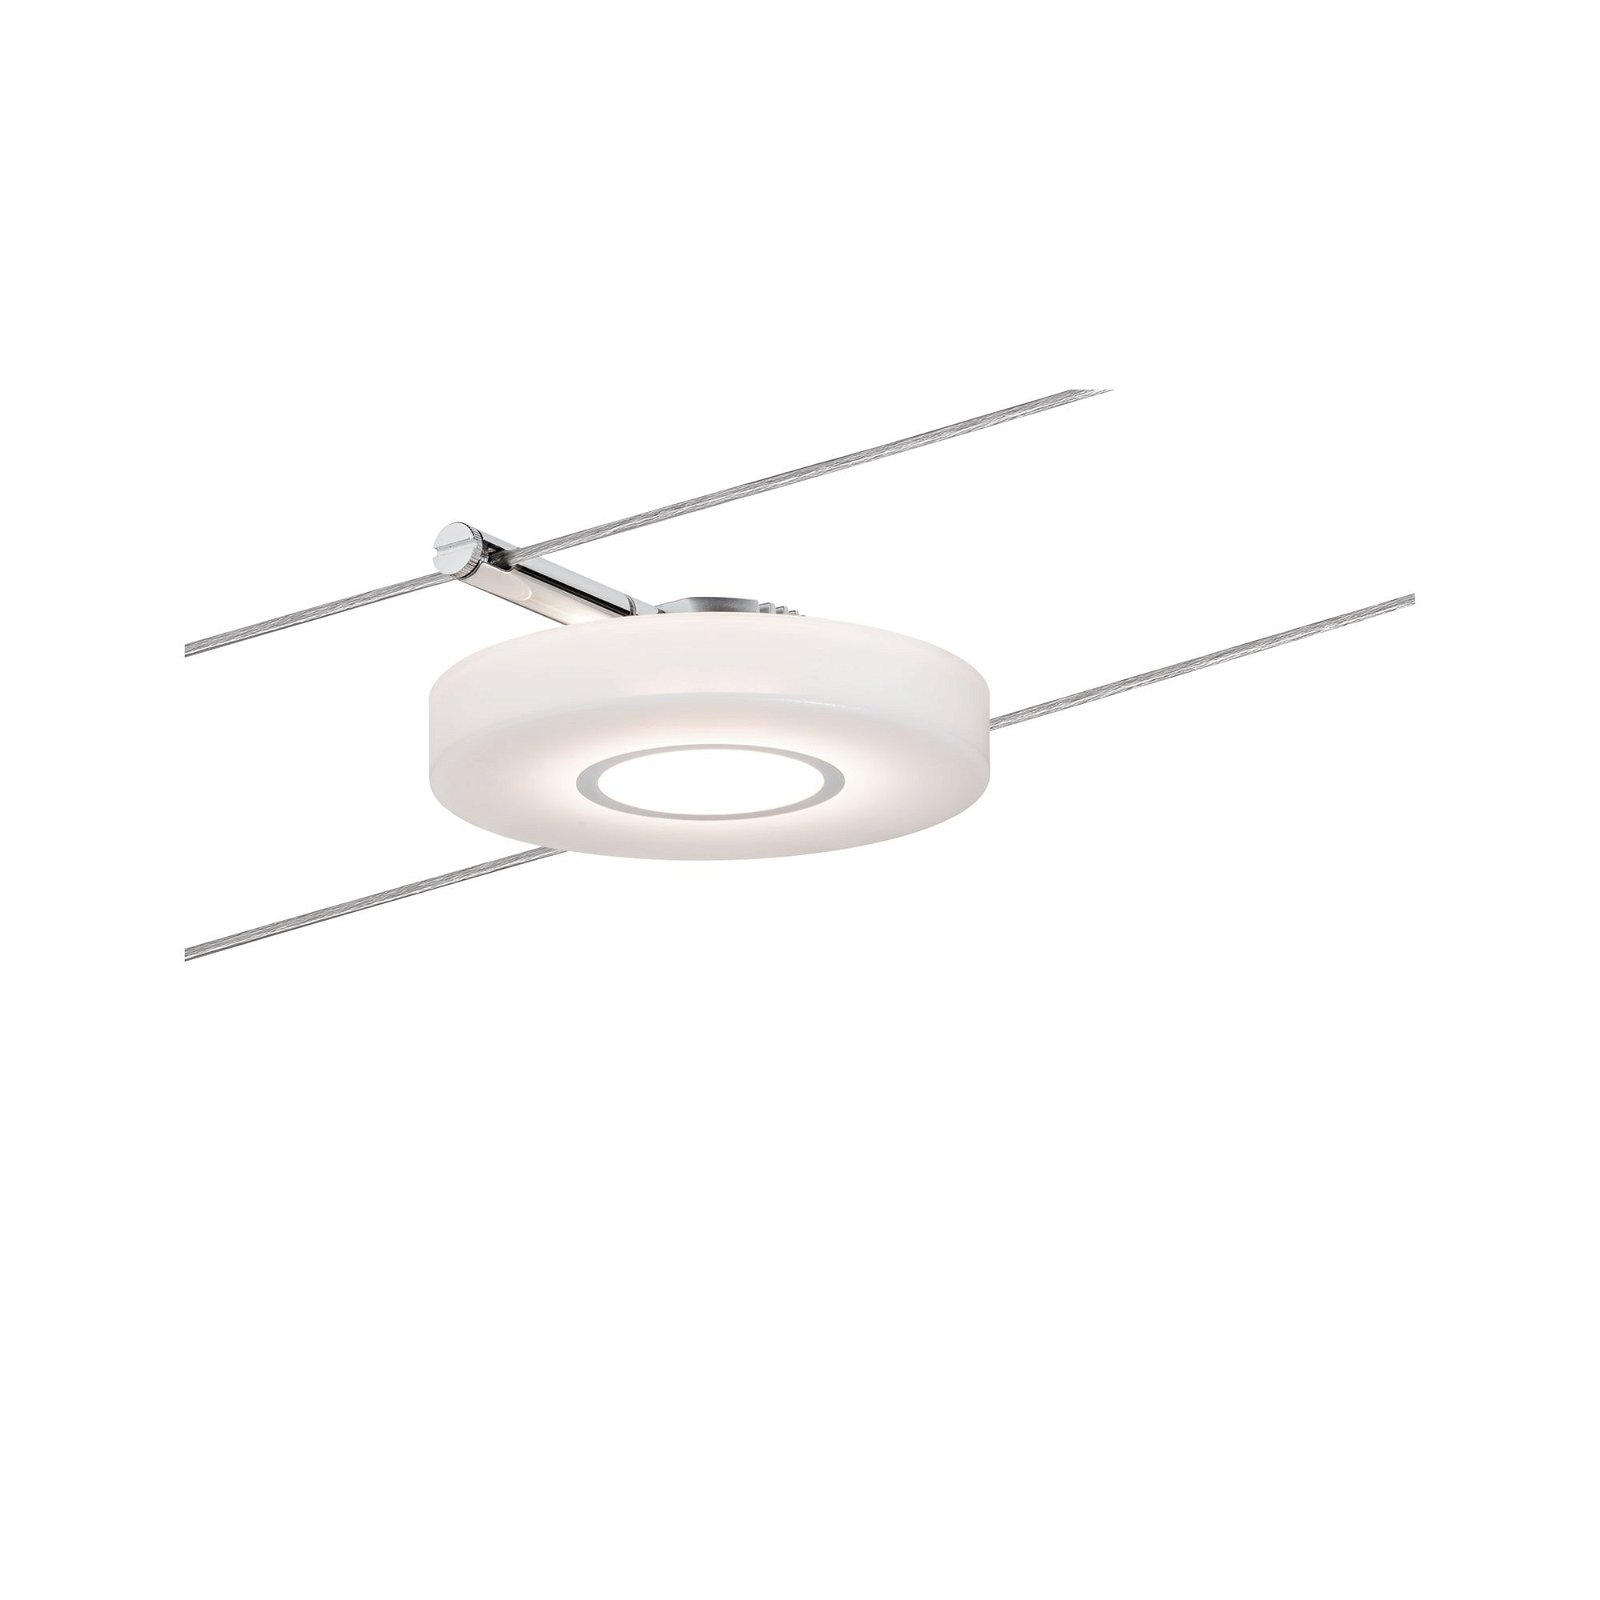 LED Seilsystem Smart Home Bluetooth DiscLED I Einzelspot 200lm 4,4W Tunable White 12V Satin